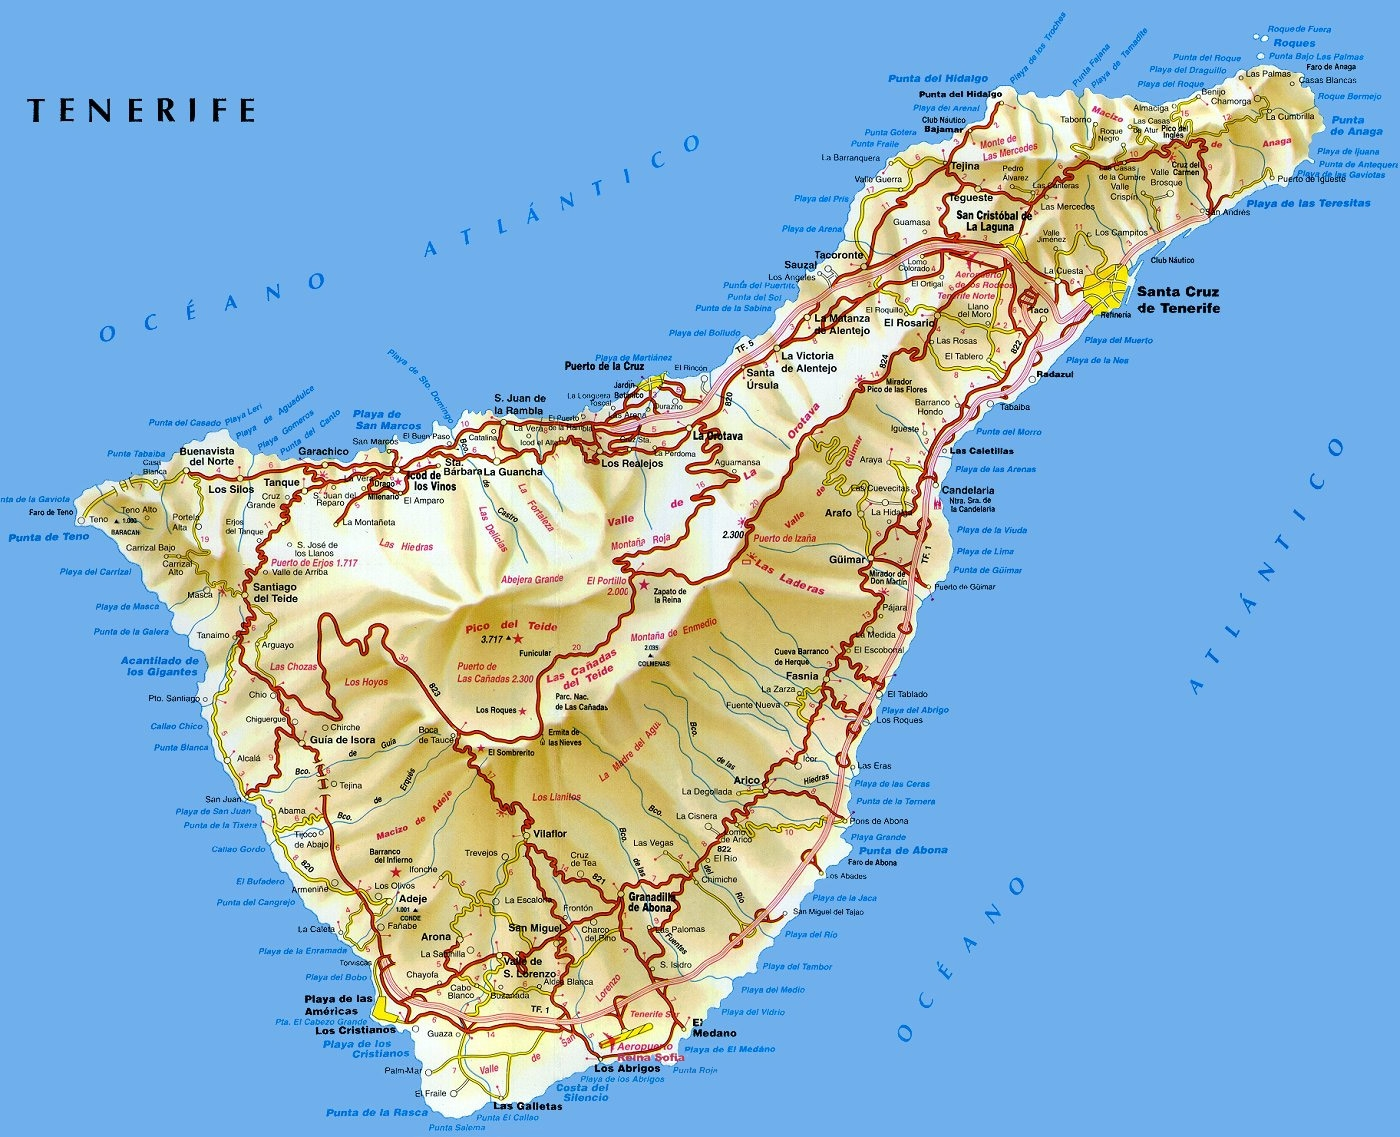 Mapa De Tenerife Sur.Tenerife Map Tenerife Island Maps Map Of Tenerife